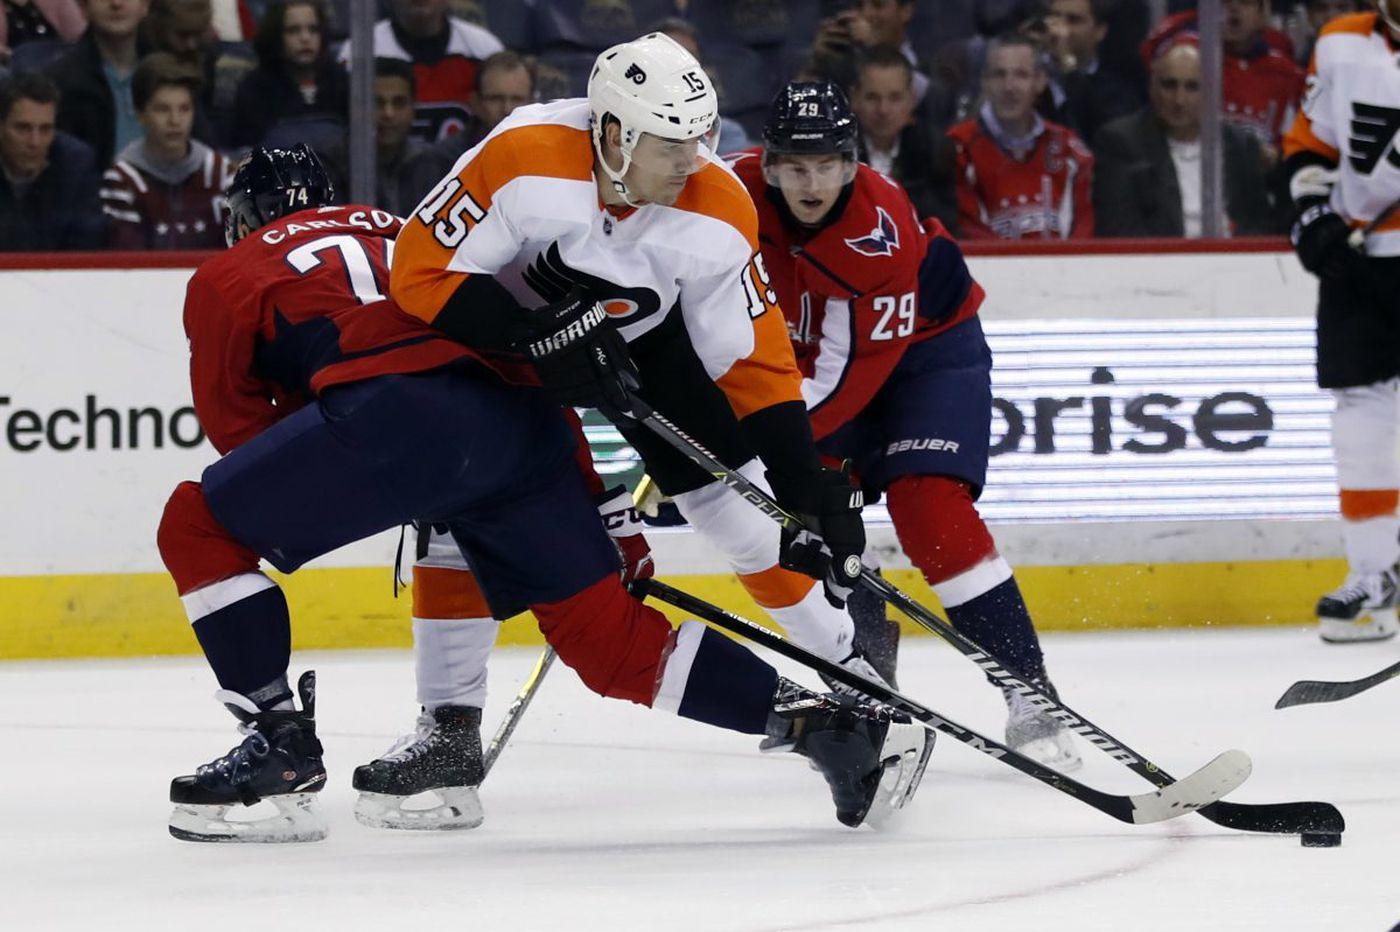 Flyers, ailing Michal Neuvirth lose to Washington Capitals